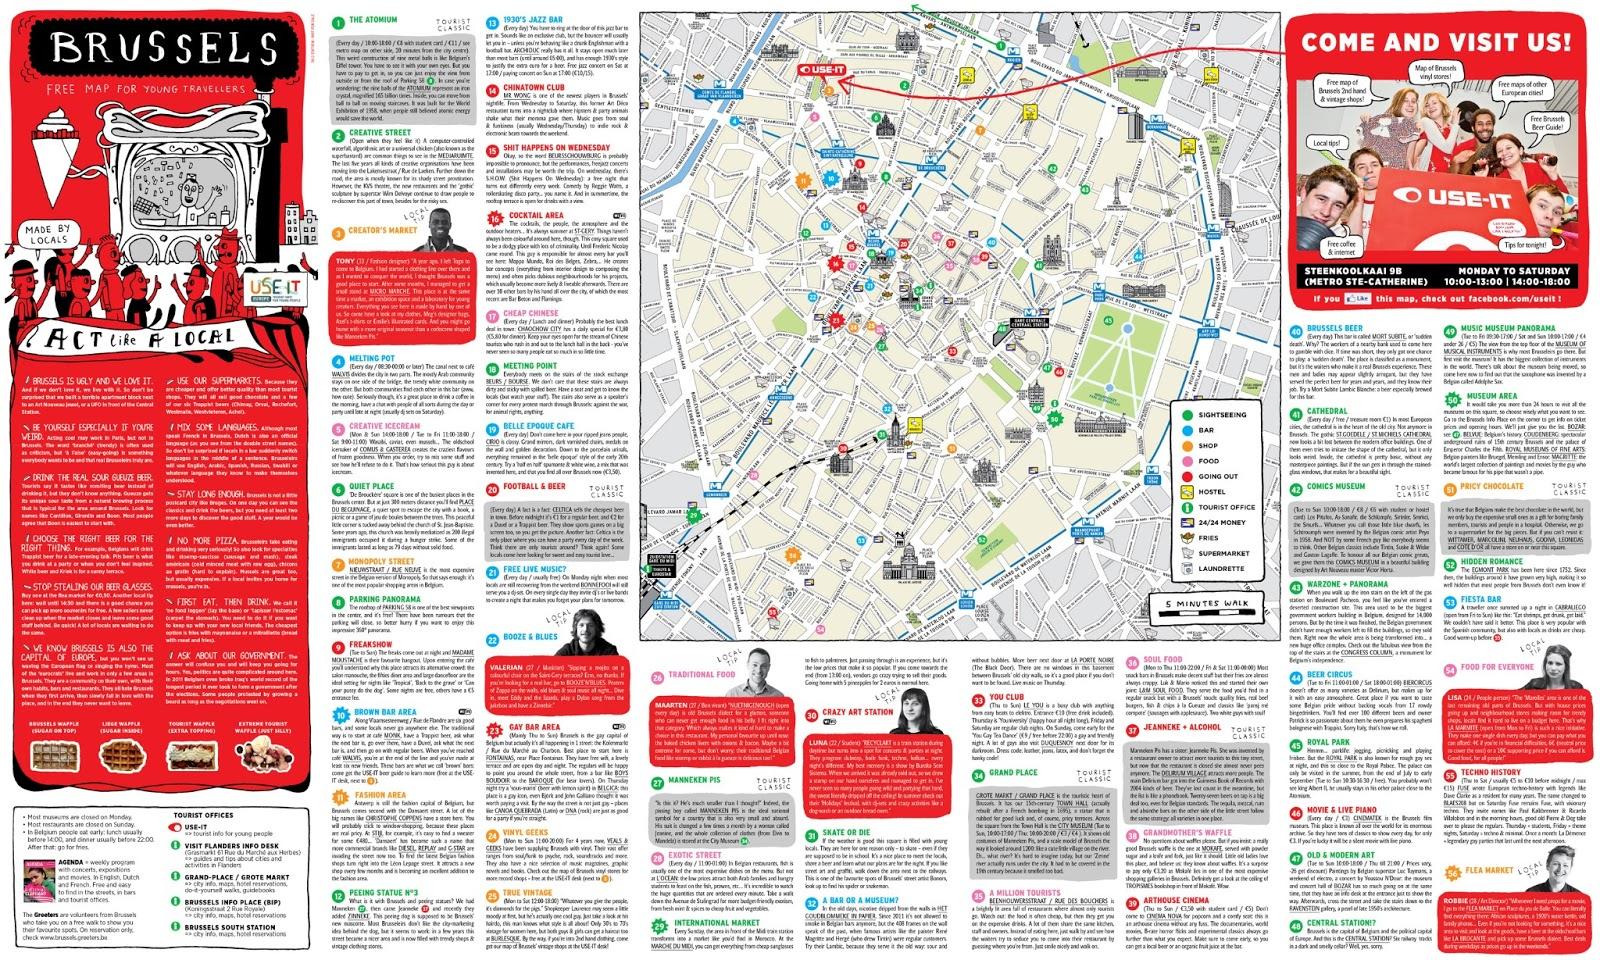 Transport Map Brussels Brussels Belgium Tourist Attractions Map – Brussels Tourist Map